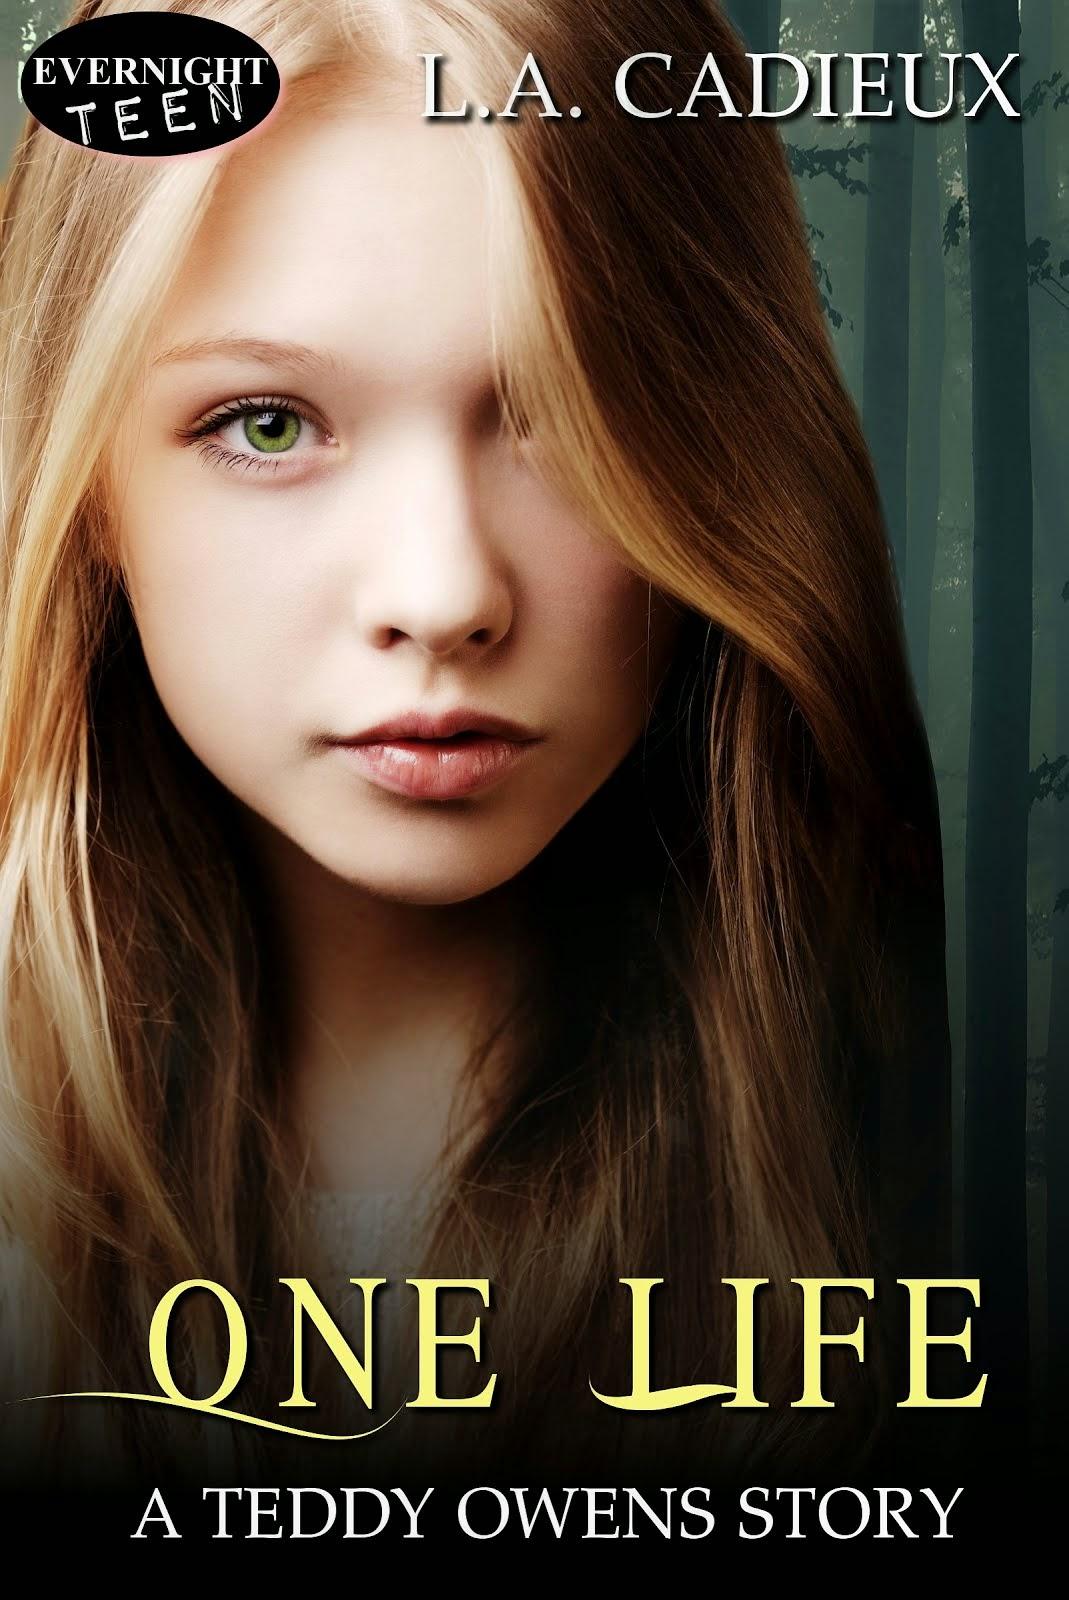 ONE LIFE: A TEDDY OWENS STORY